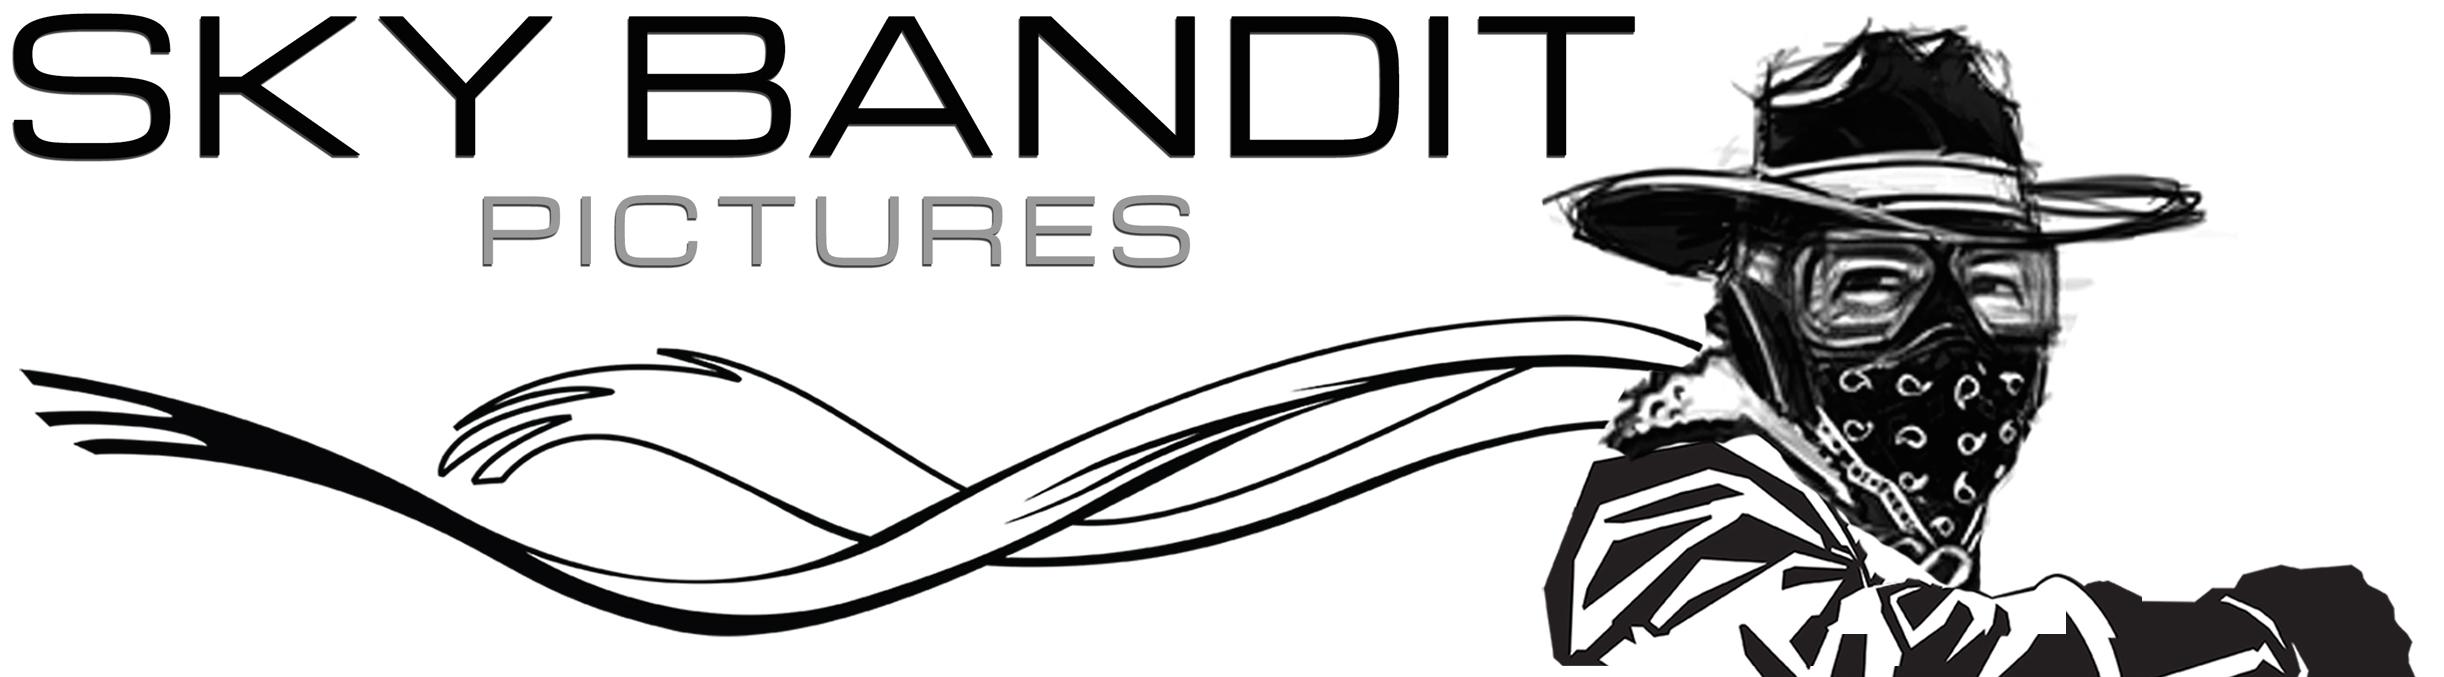 Sky Bandit Pictures